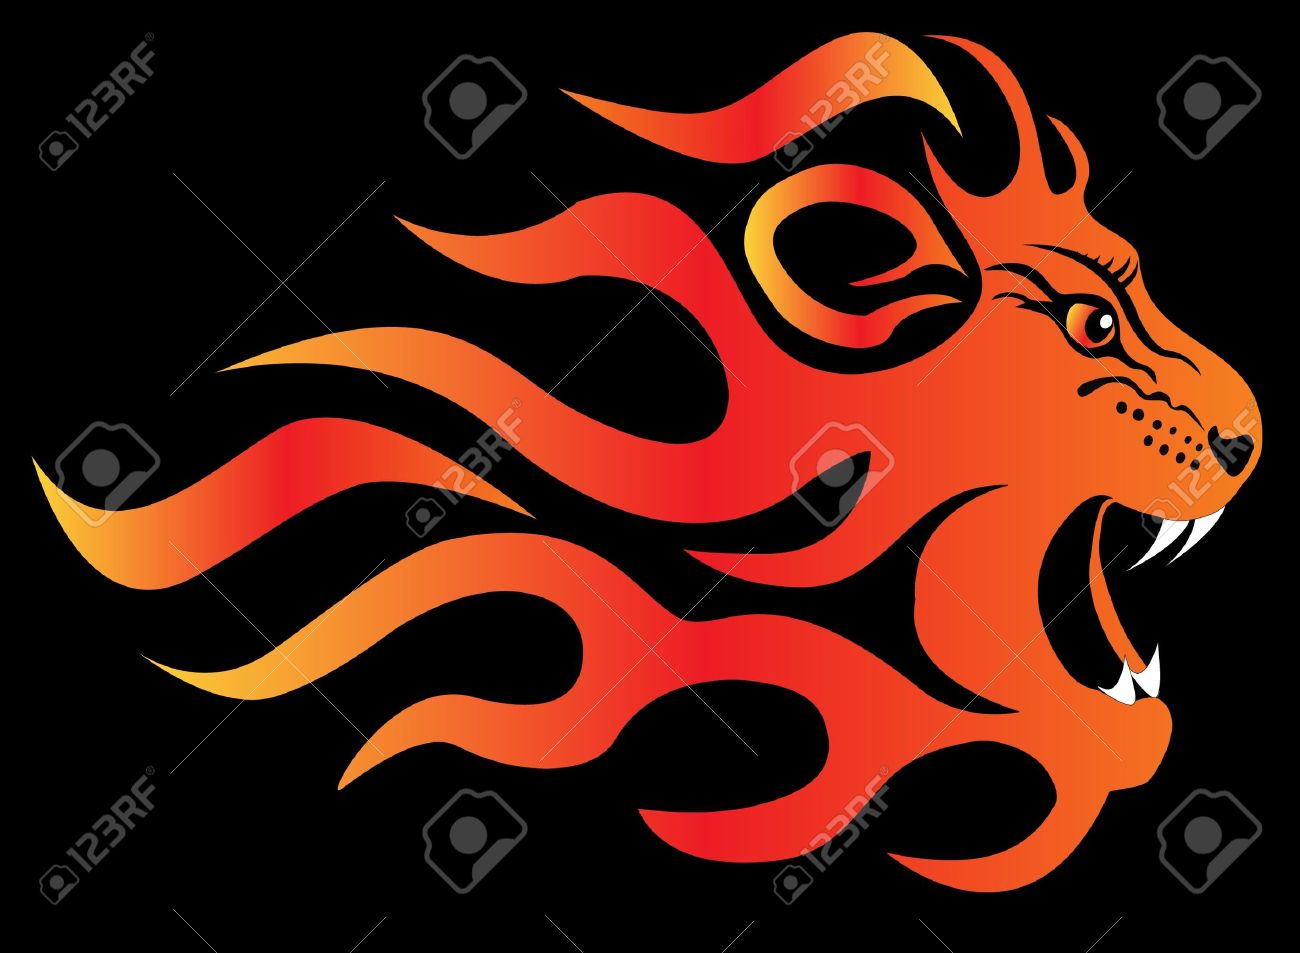 Фото лев в ярости в огне 3